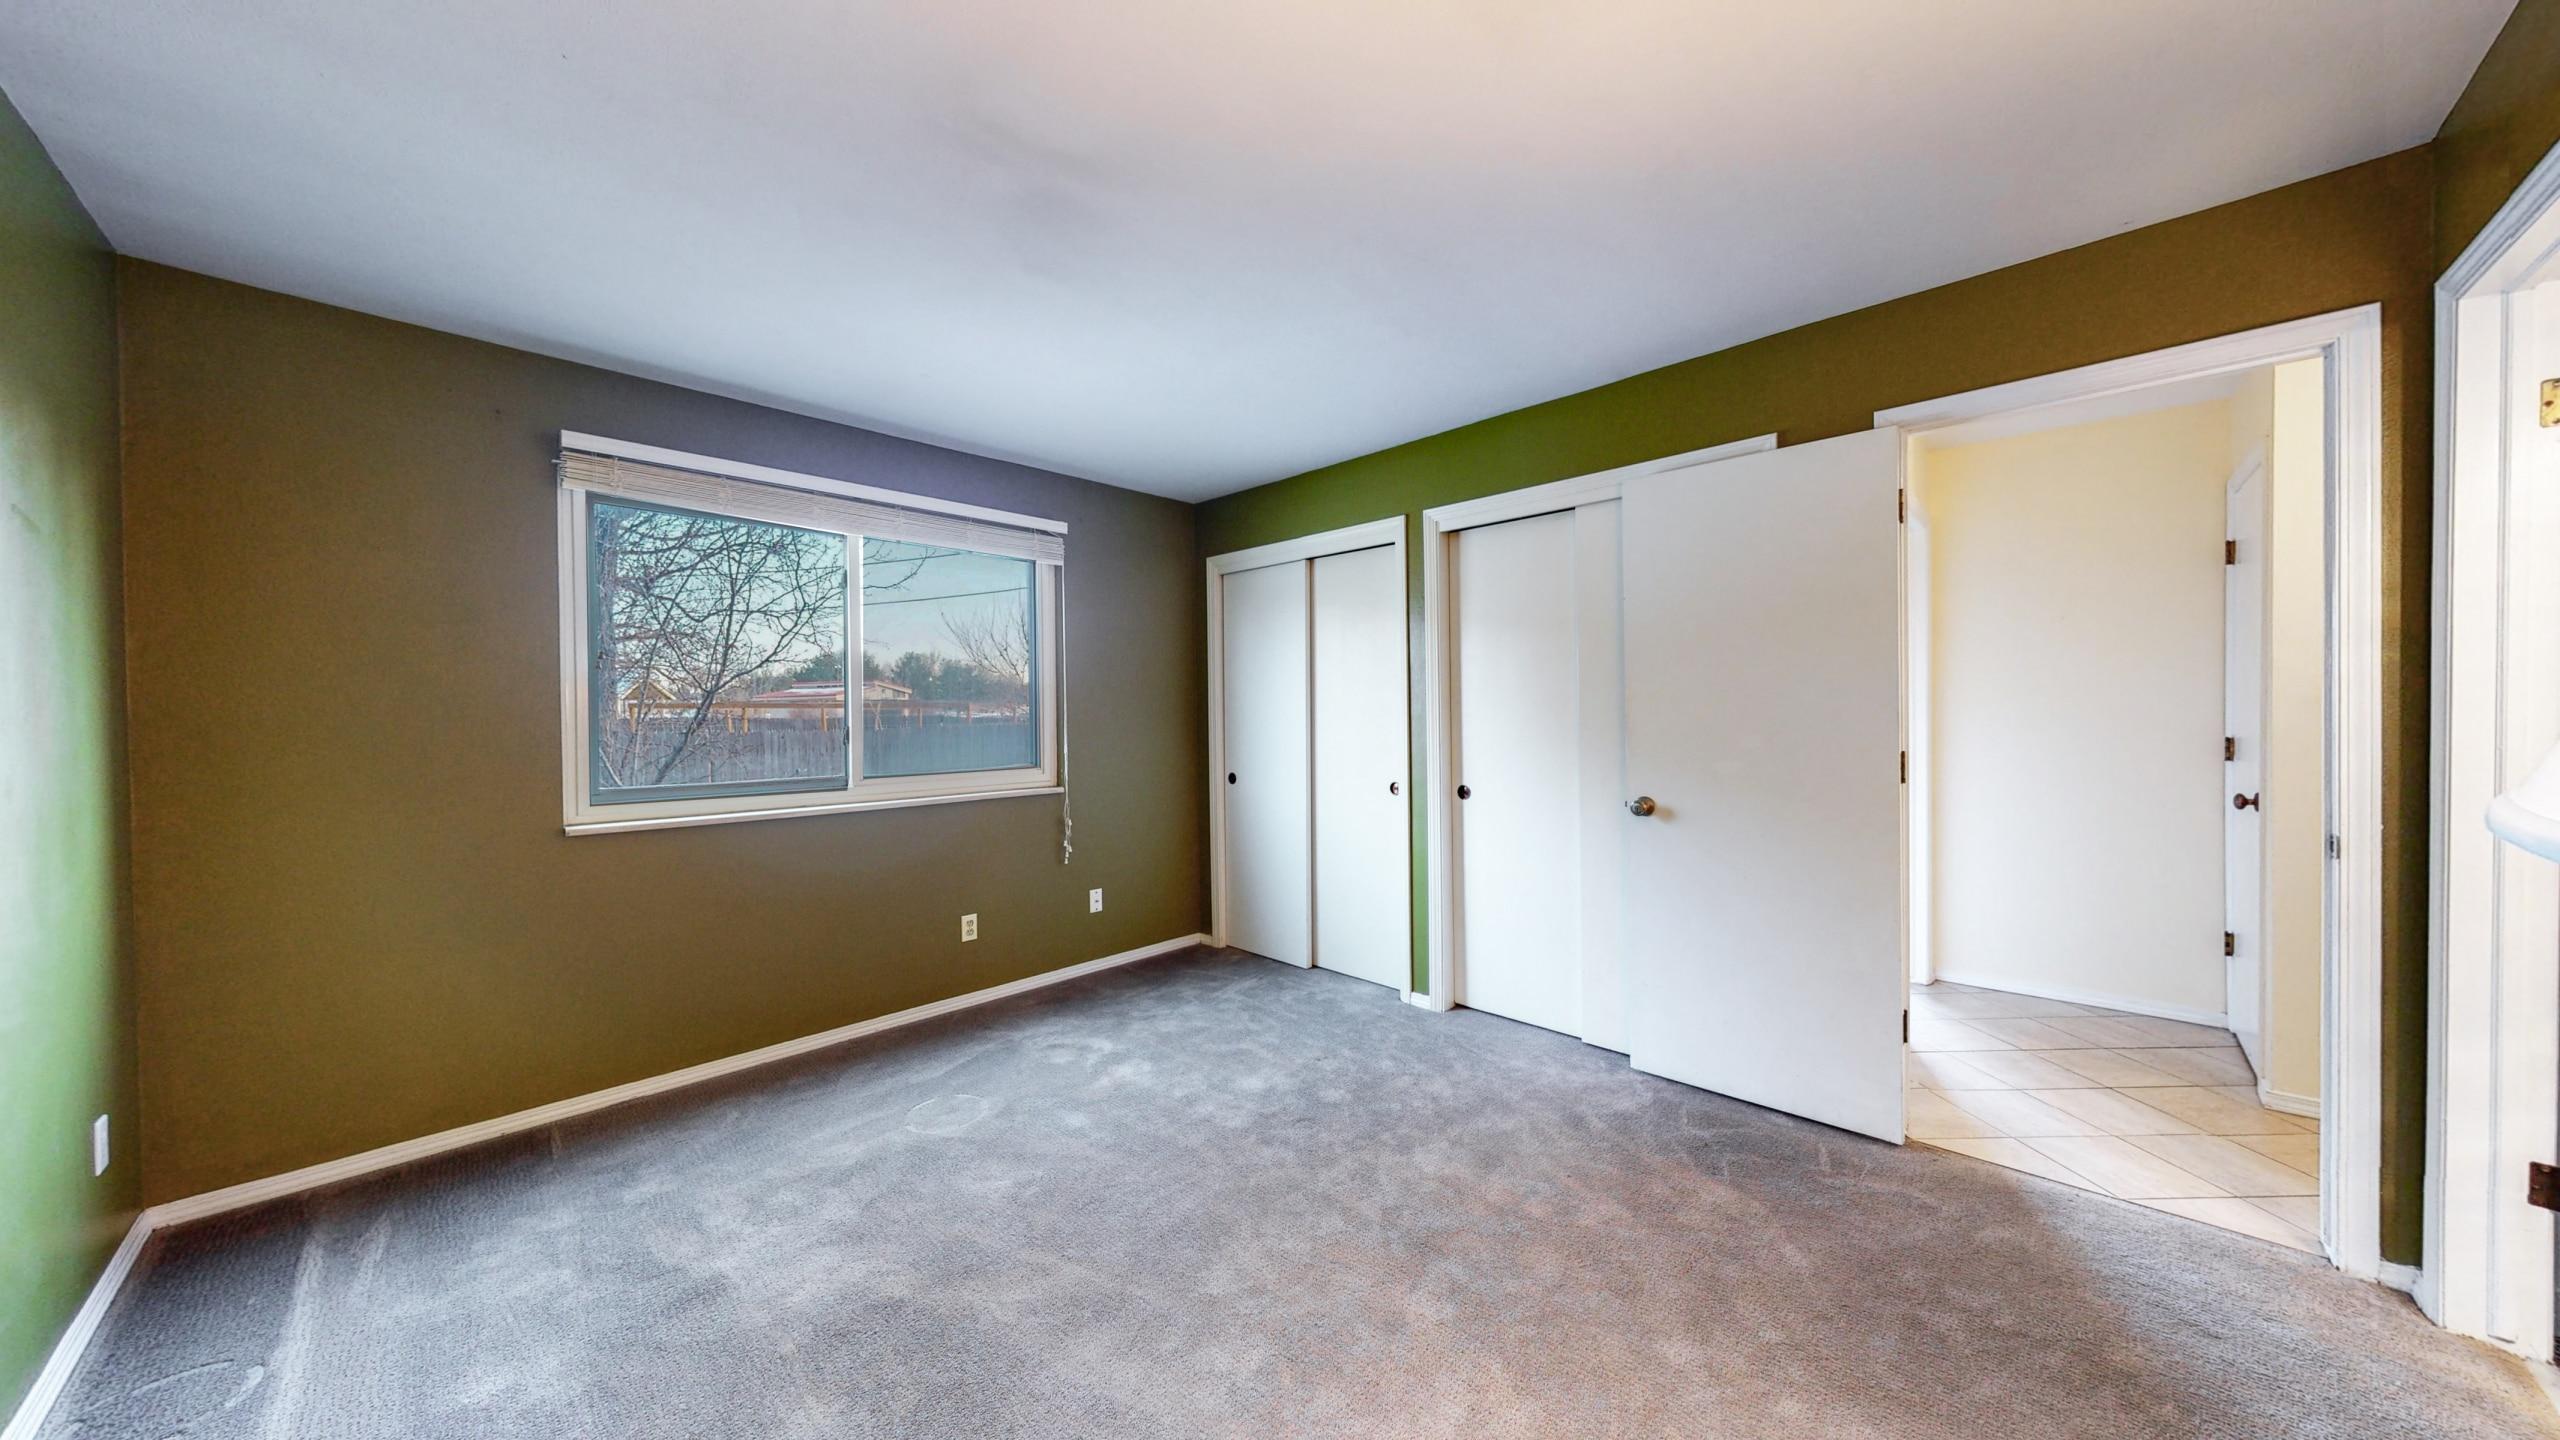 Main Floor Master Bedroom, Green Walls, White Trim